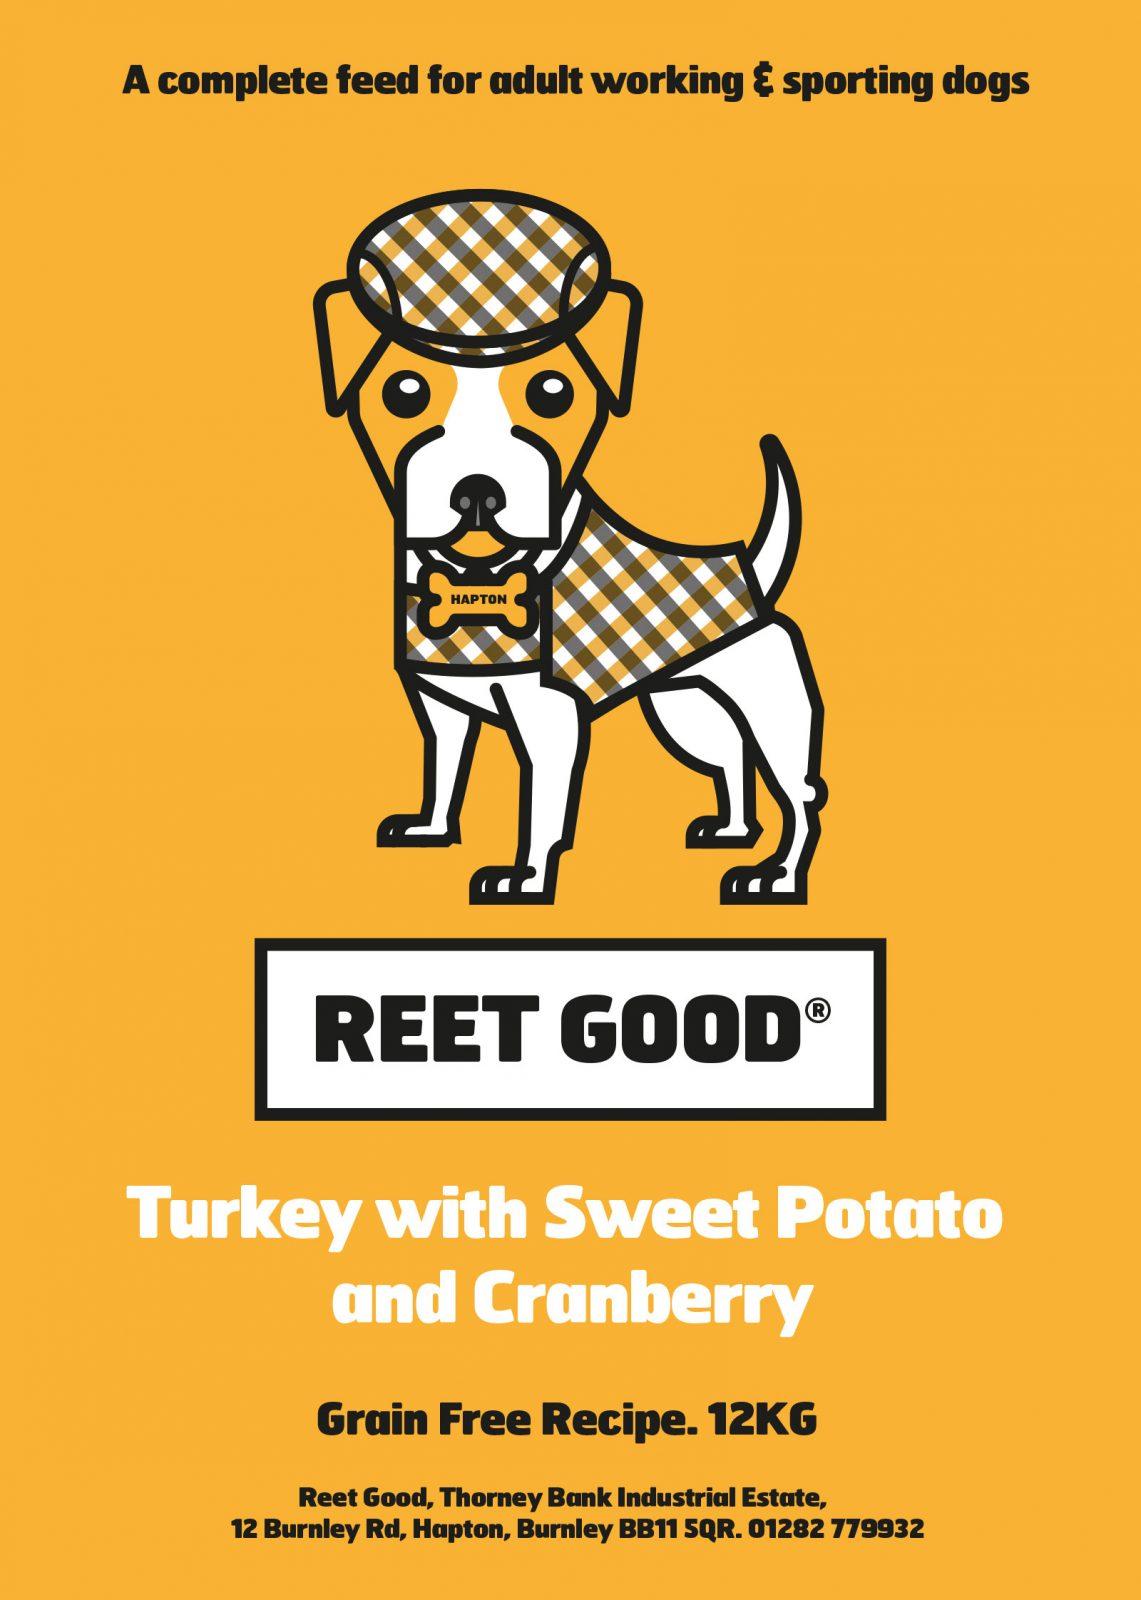 Turkey, Sweet Potato & Cranberry